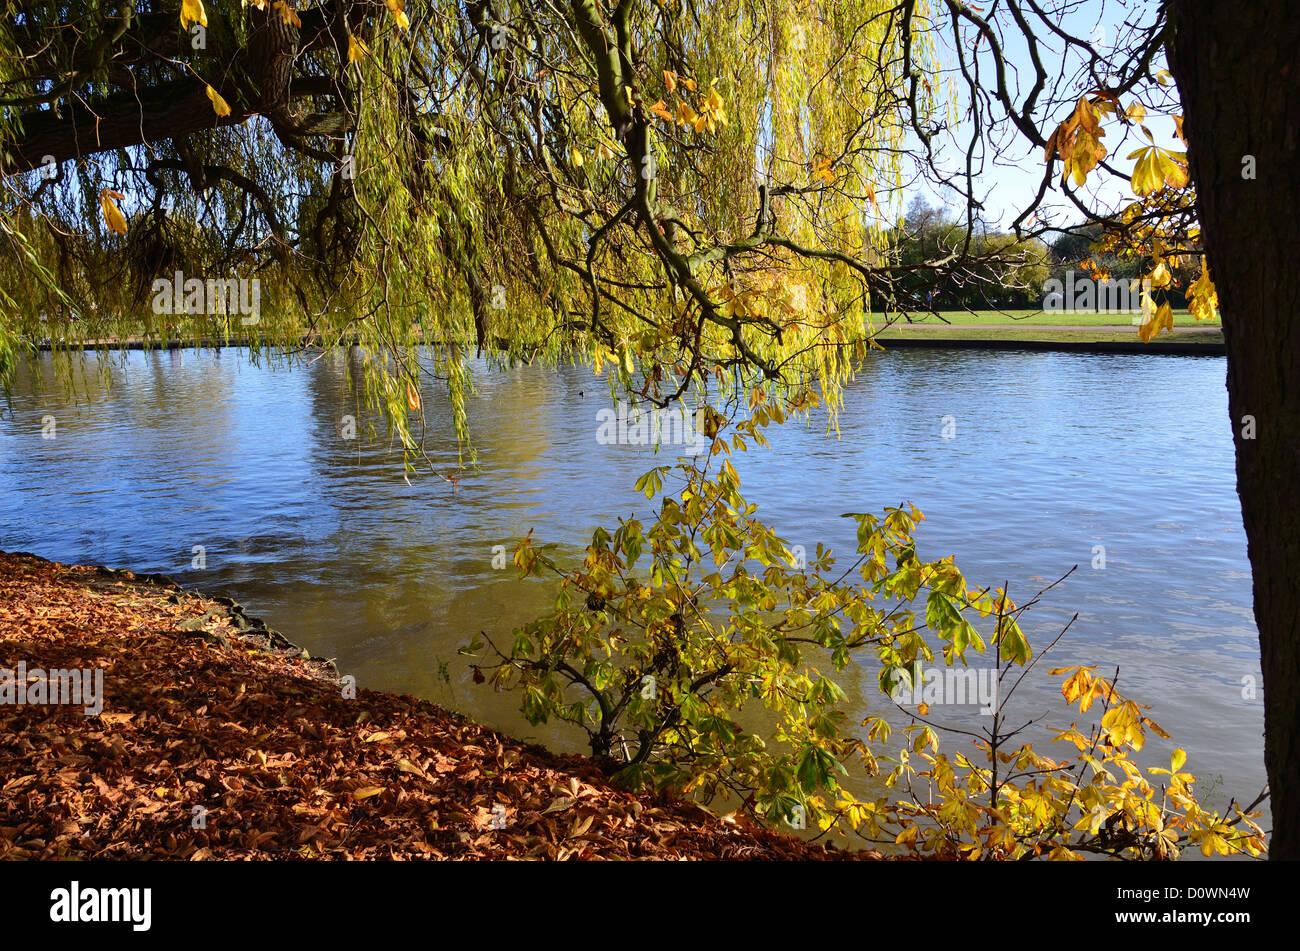 Autumn River Scene - Stock Image